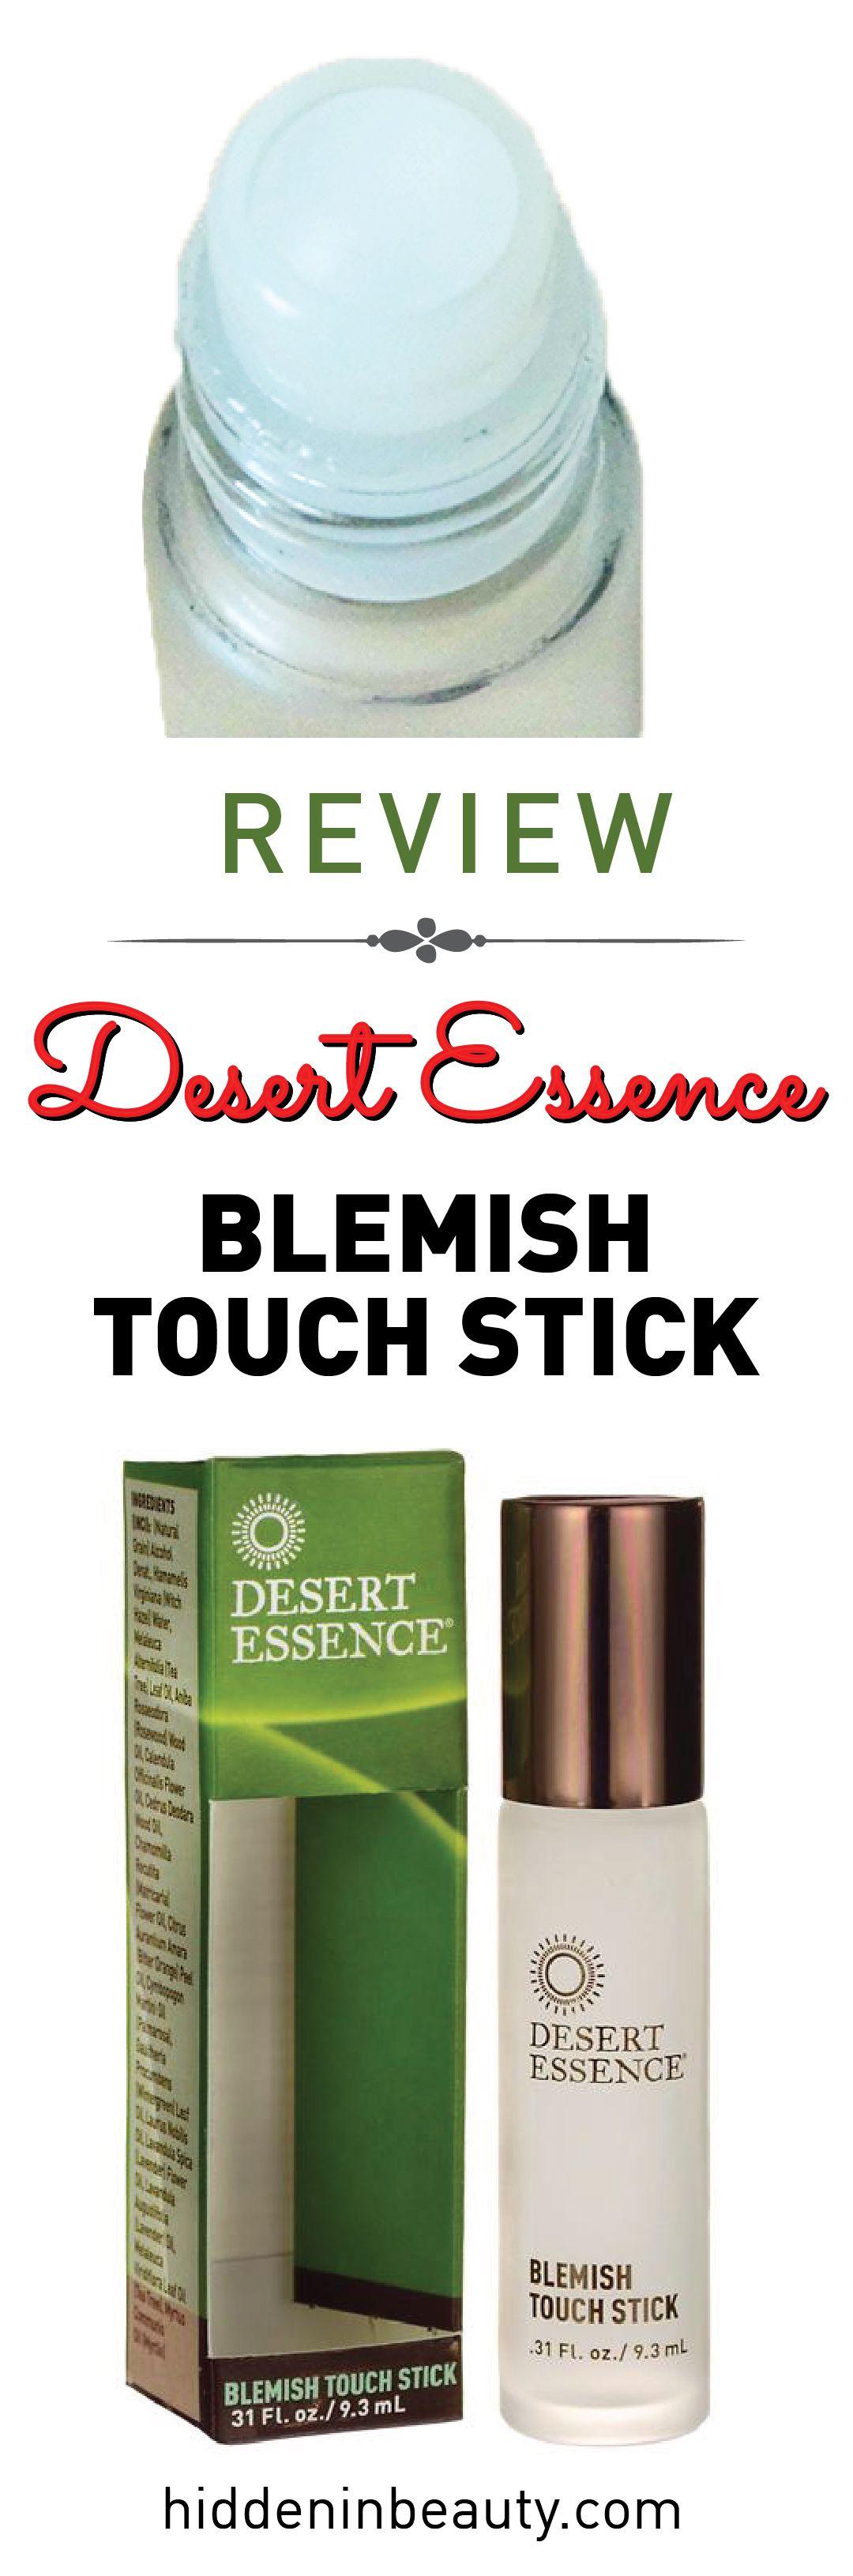 Review Desert Essence, Blemish Touch Stick Beauty